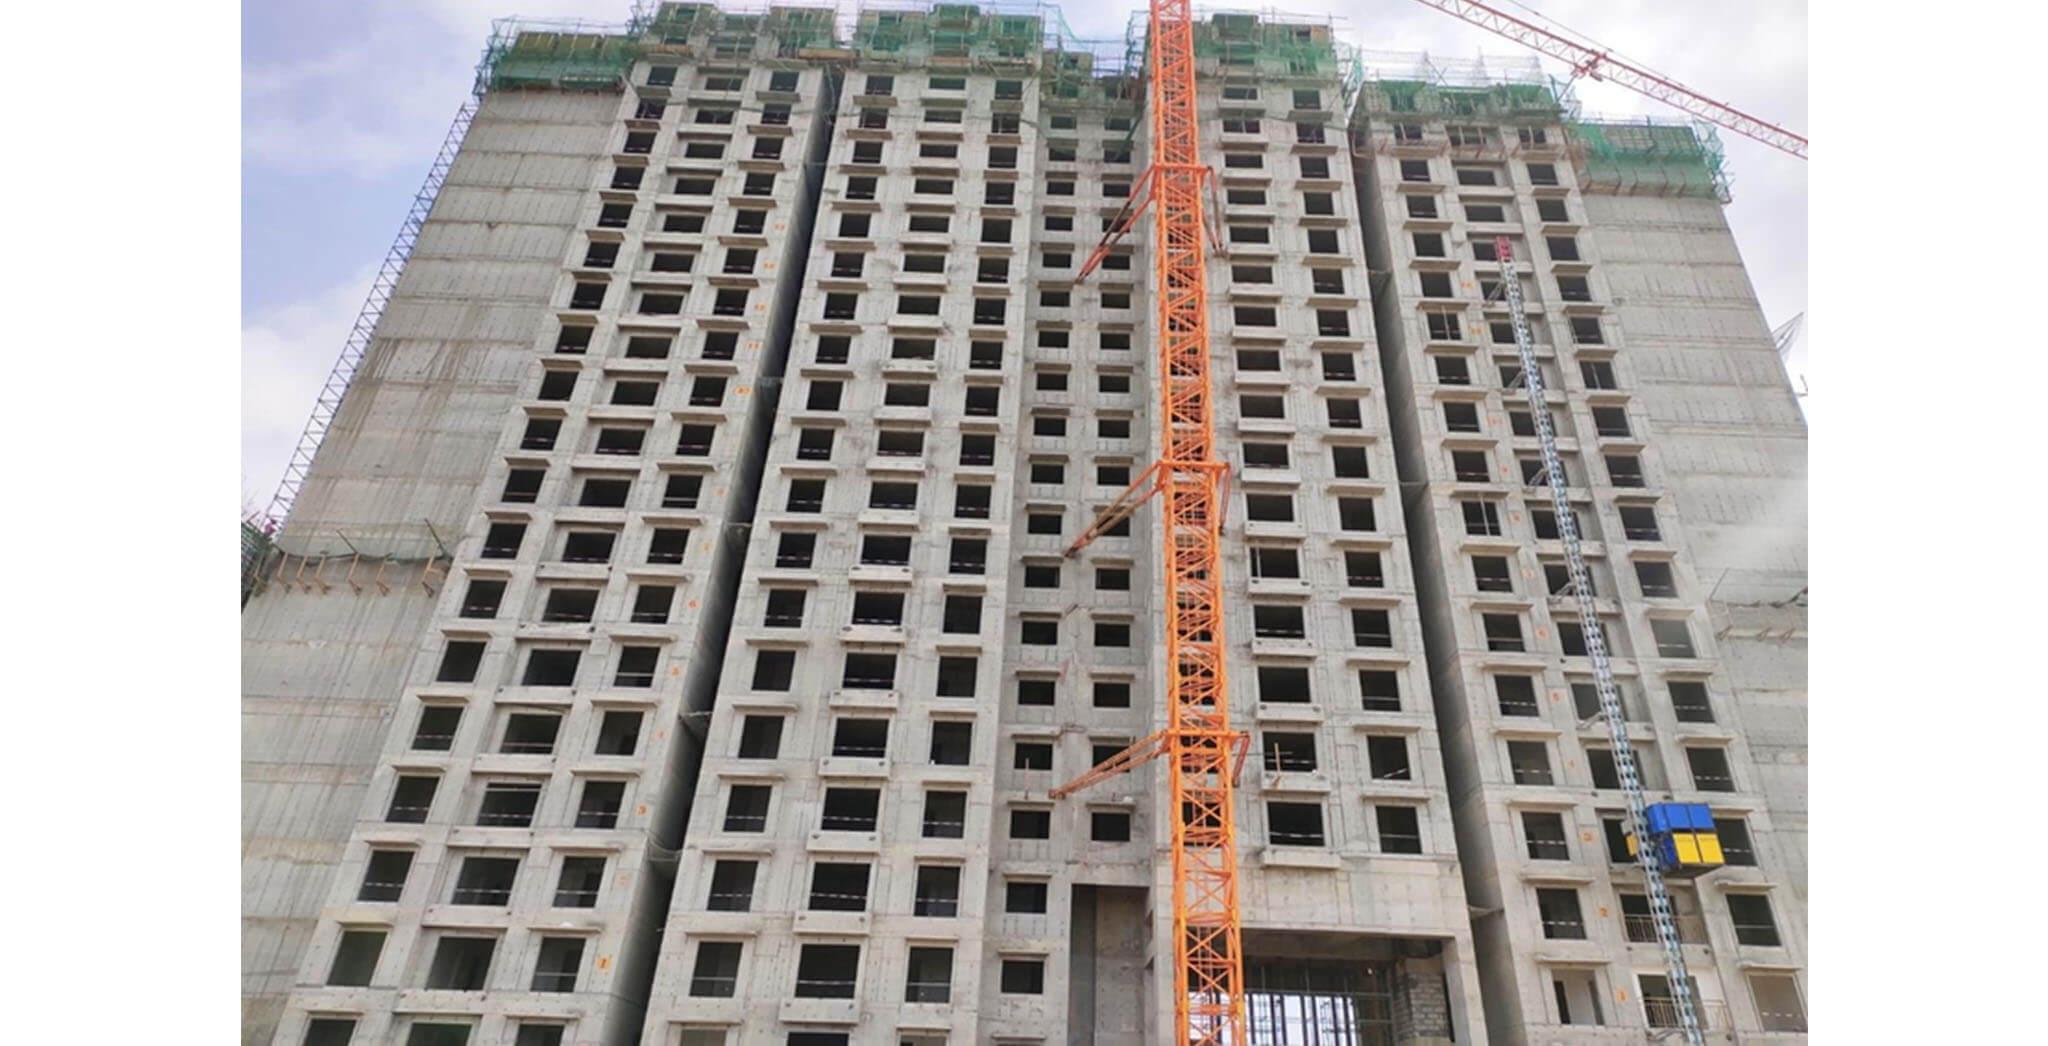 Jun 2021 - Gallium Block: South side elevation—GF to 20th floor